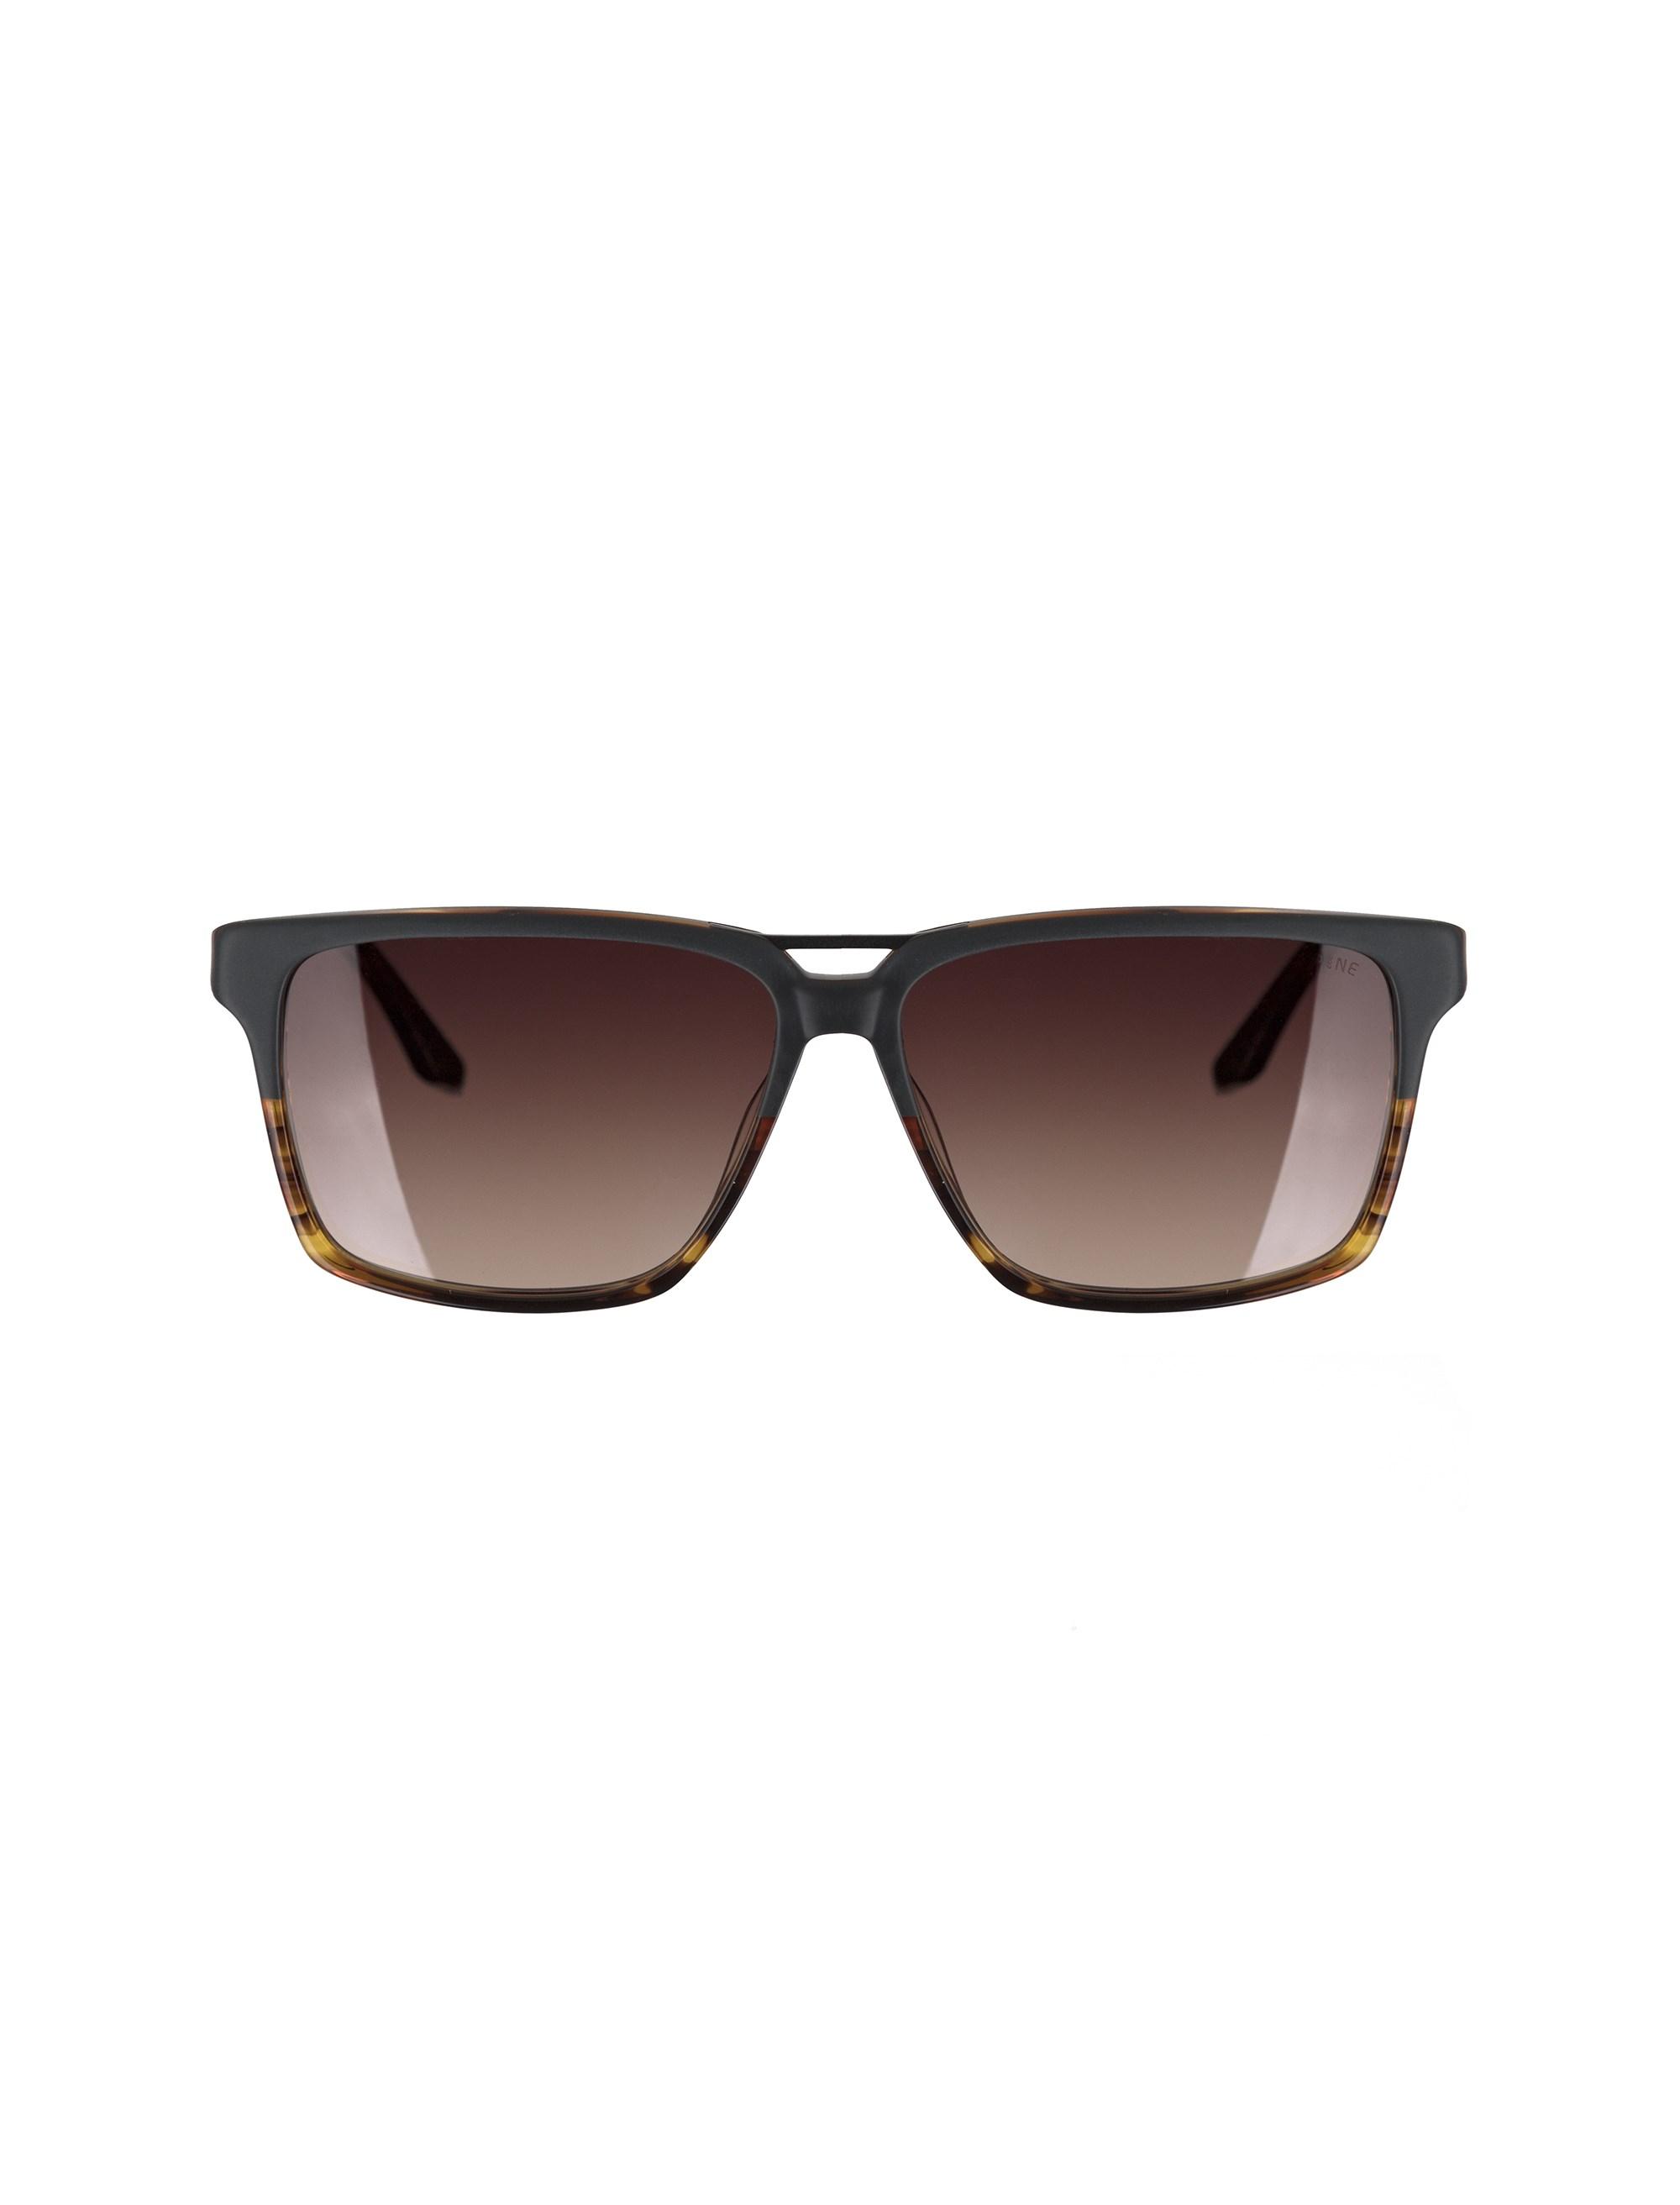 عینک آفتابی ویفرر مردانه - طوسي و قهوه اي - 1